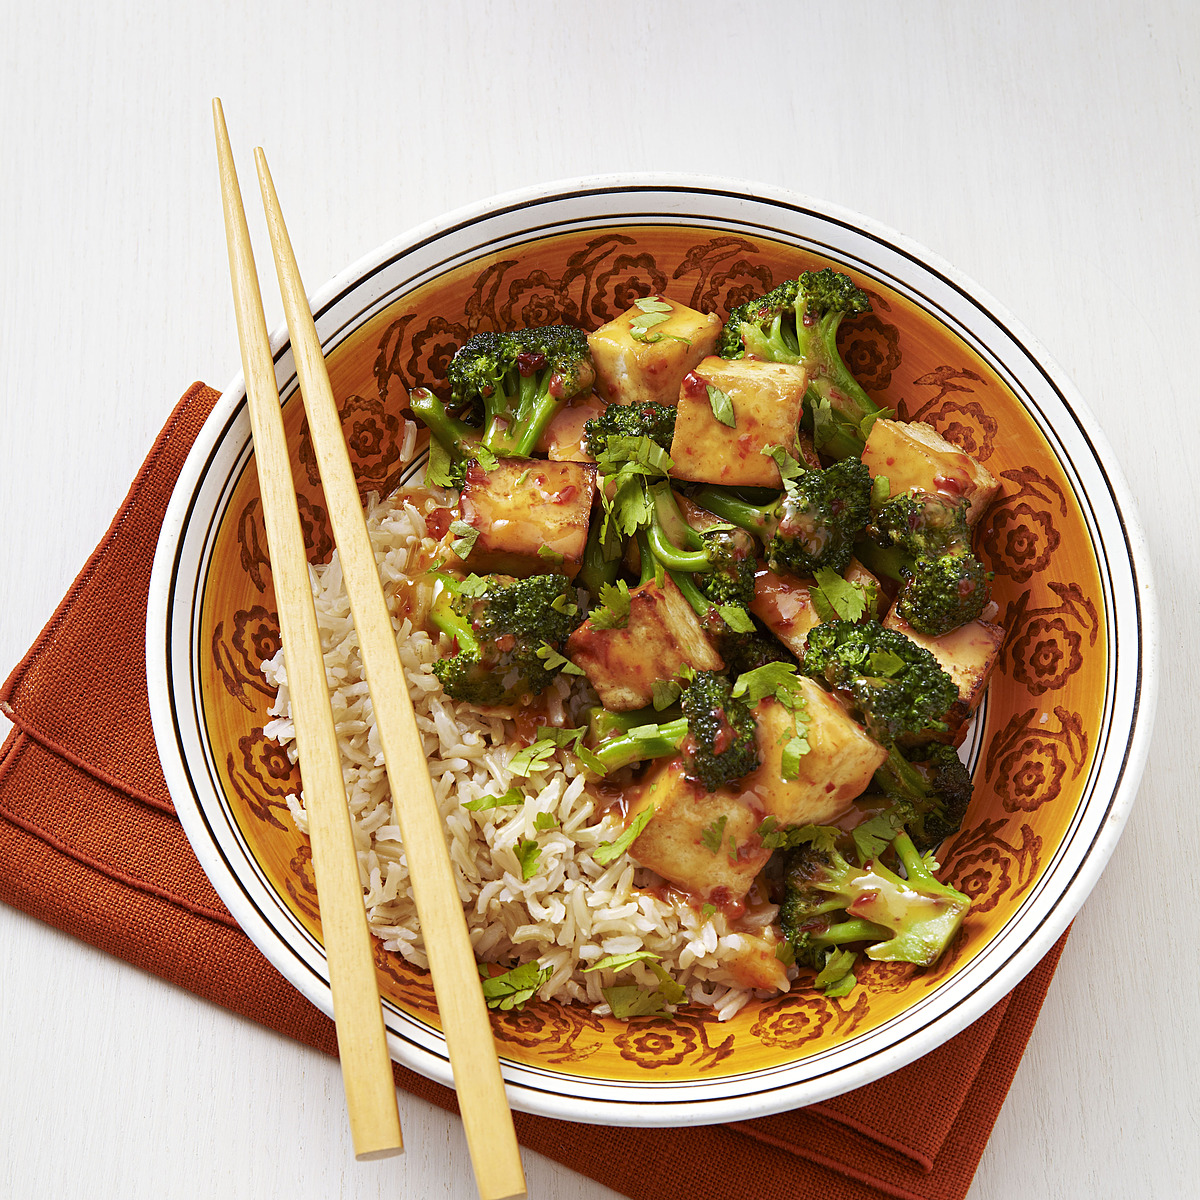 Chipotle-Orange Broccoli & Tofu